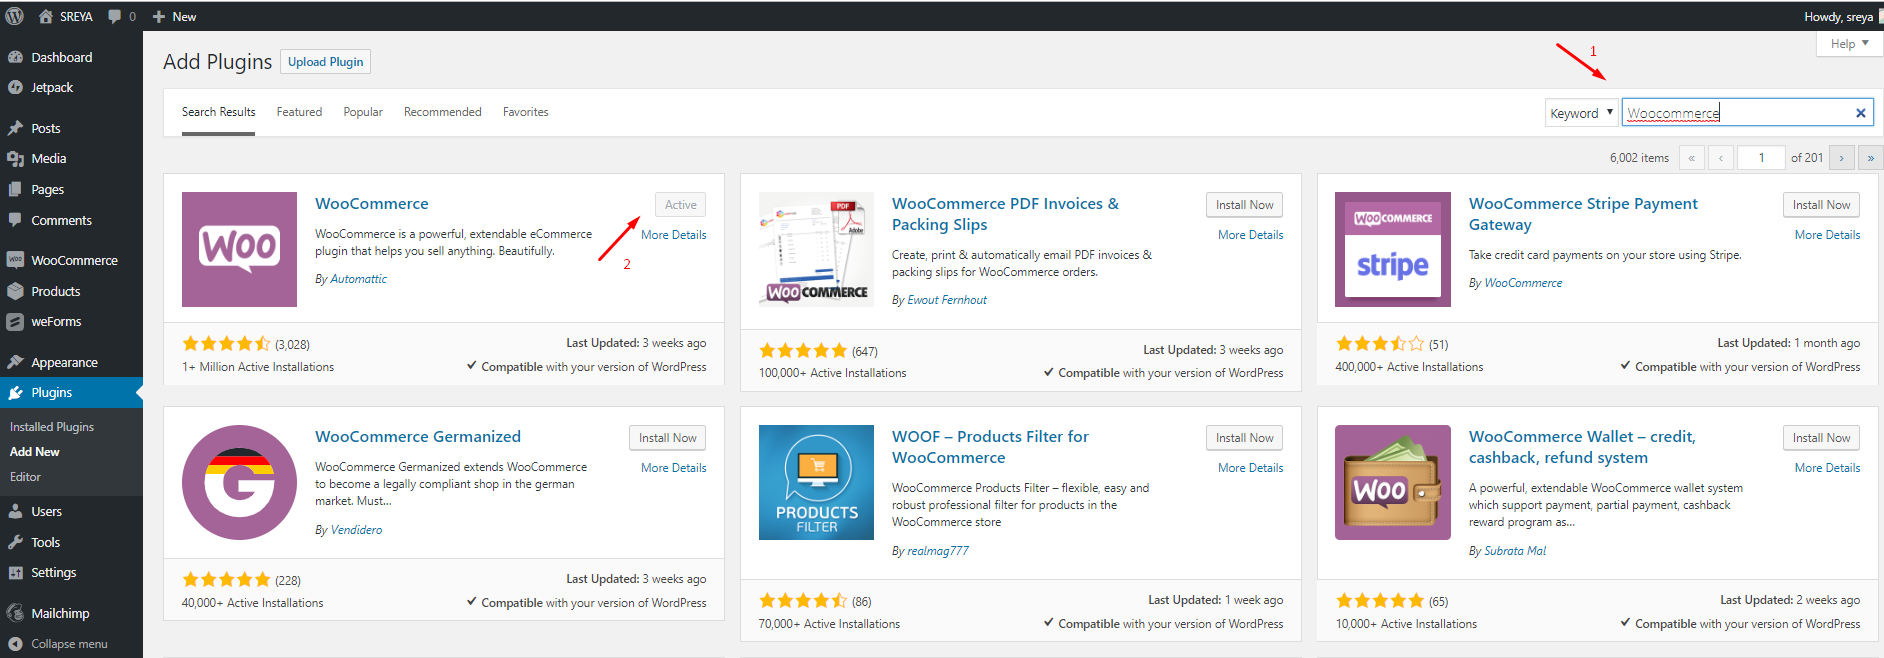 Add Woocommerce- create e-commerce website using WordPress